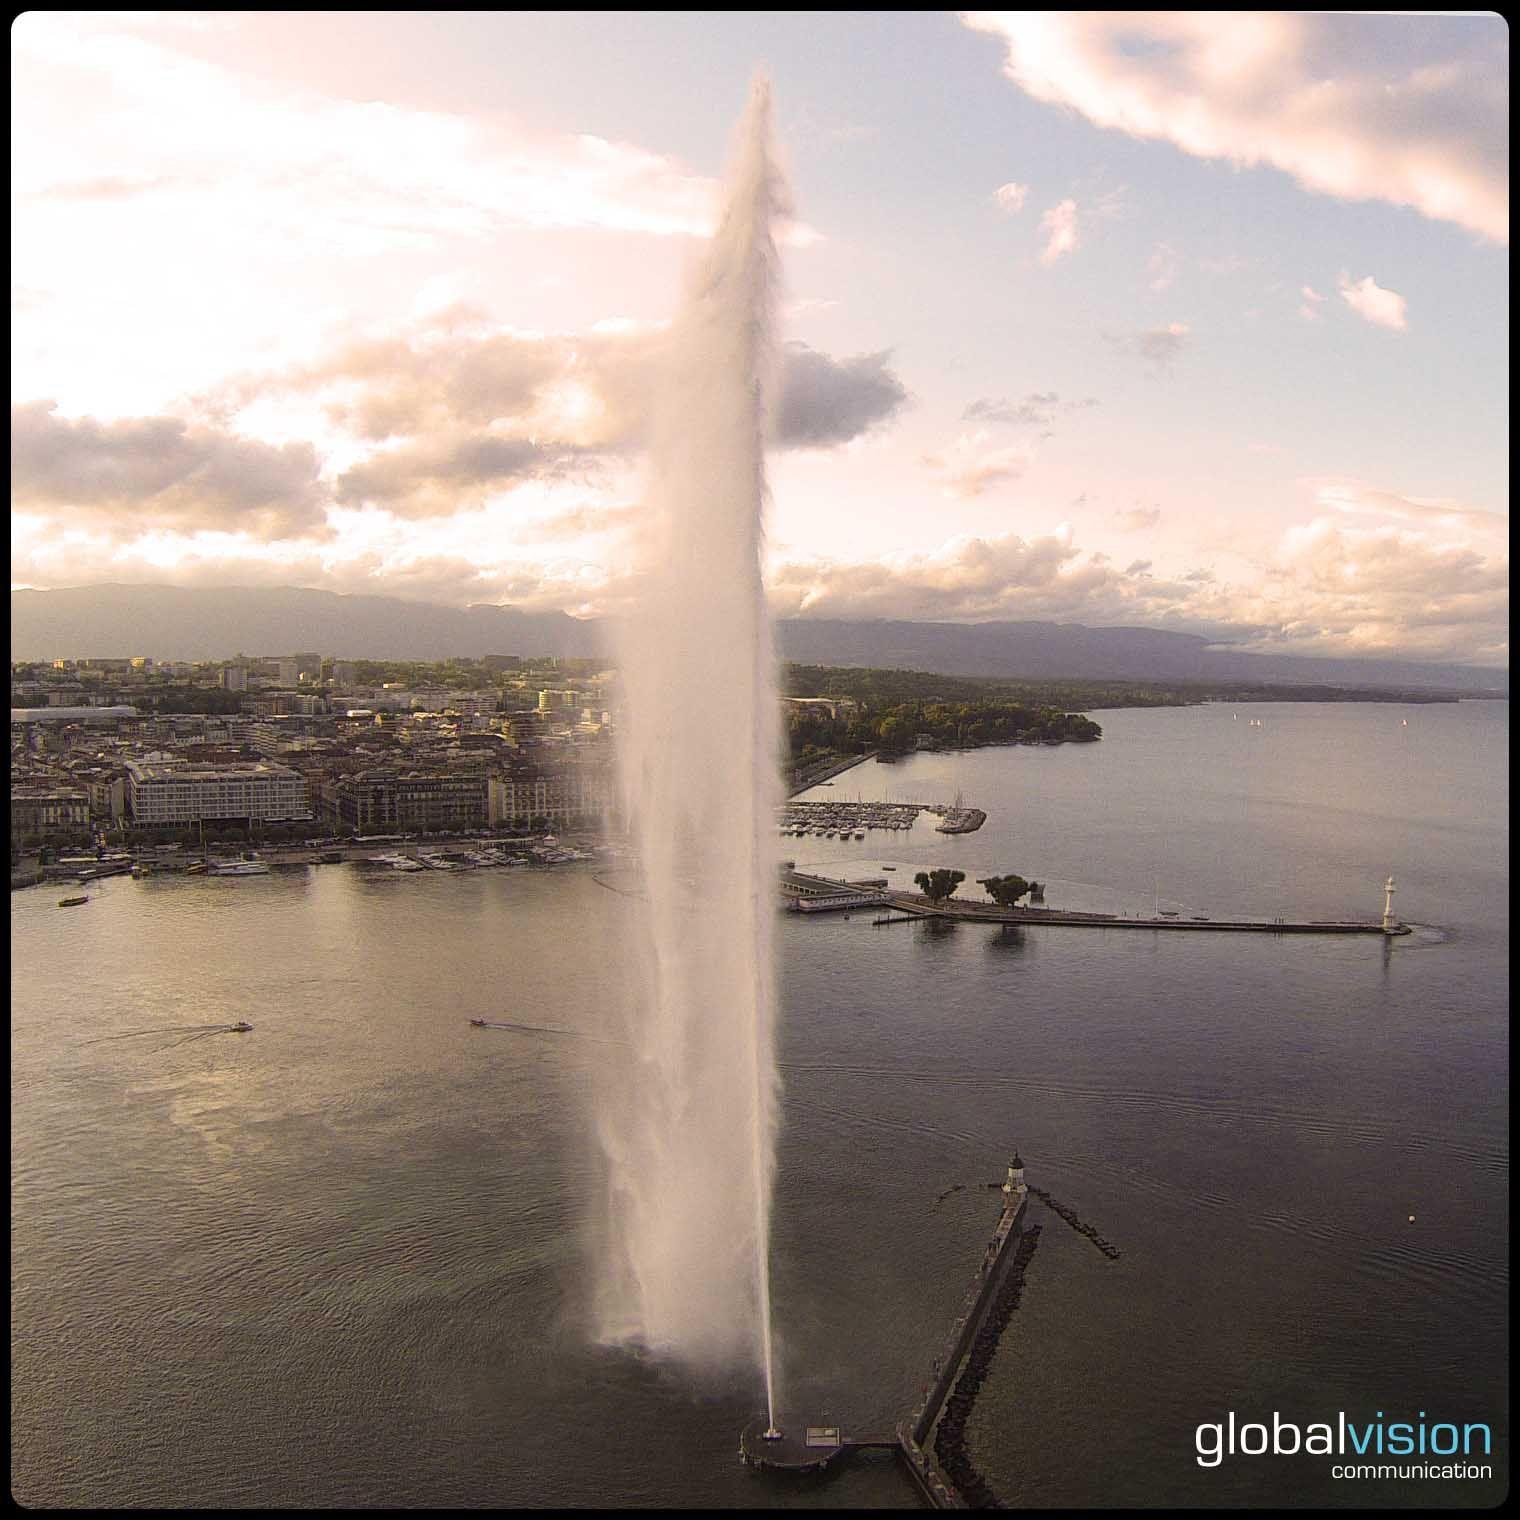 Beautiful Geneva #genevatourism #visitgeneva #visitgva #aerial #aerialview #aerialphoto #aerialcity #drone #dronephoto #dronefly #dronestagram #droneoftheday #picoftheday #photoofheday #S1000 #camera #sony #nex7 #panorama #360